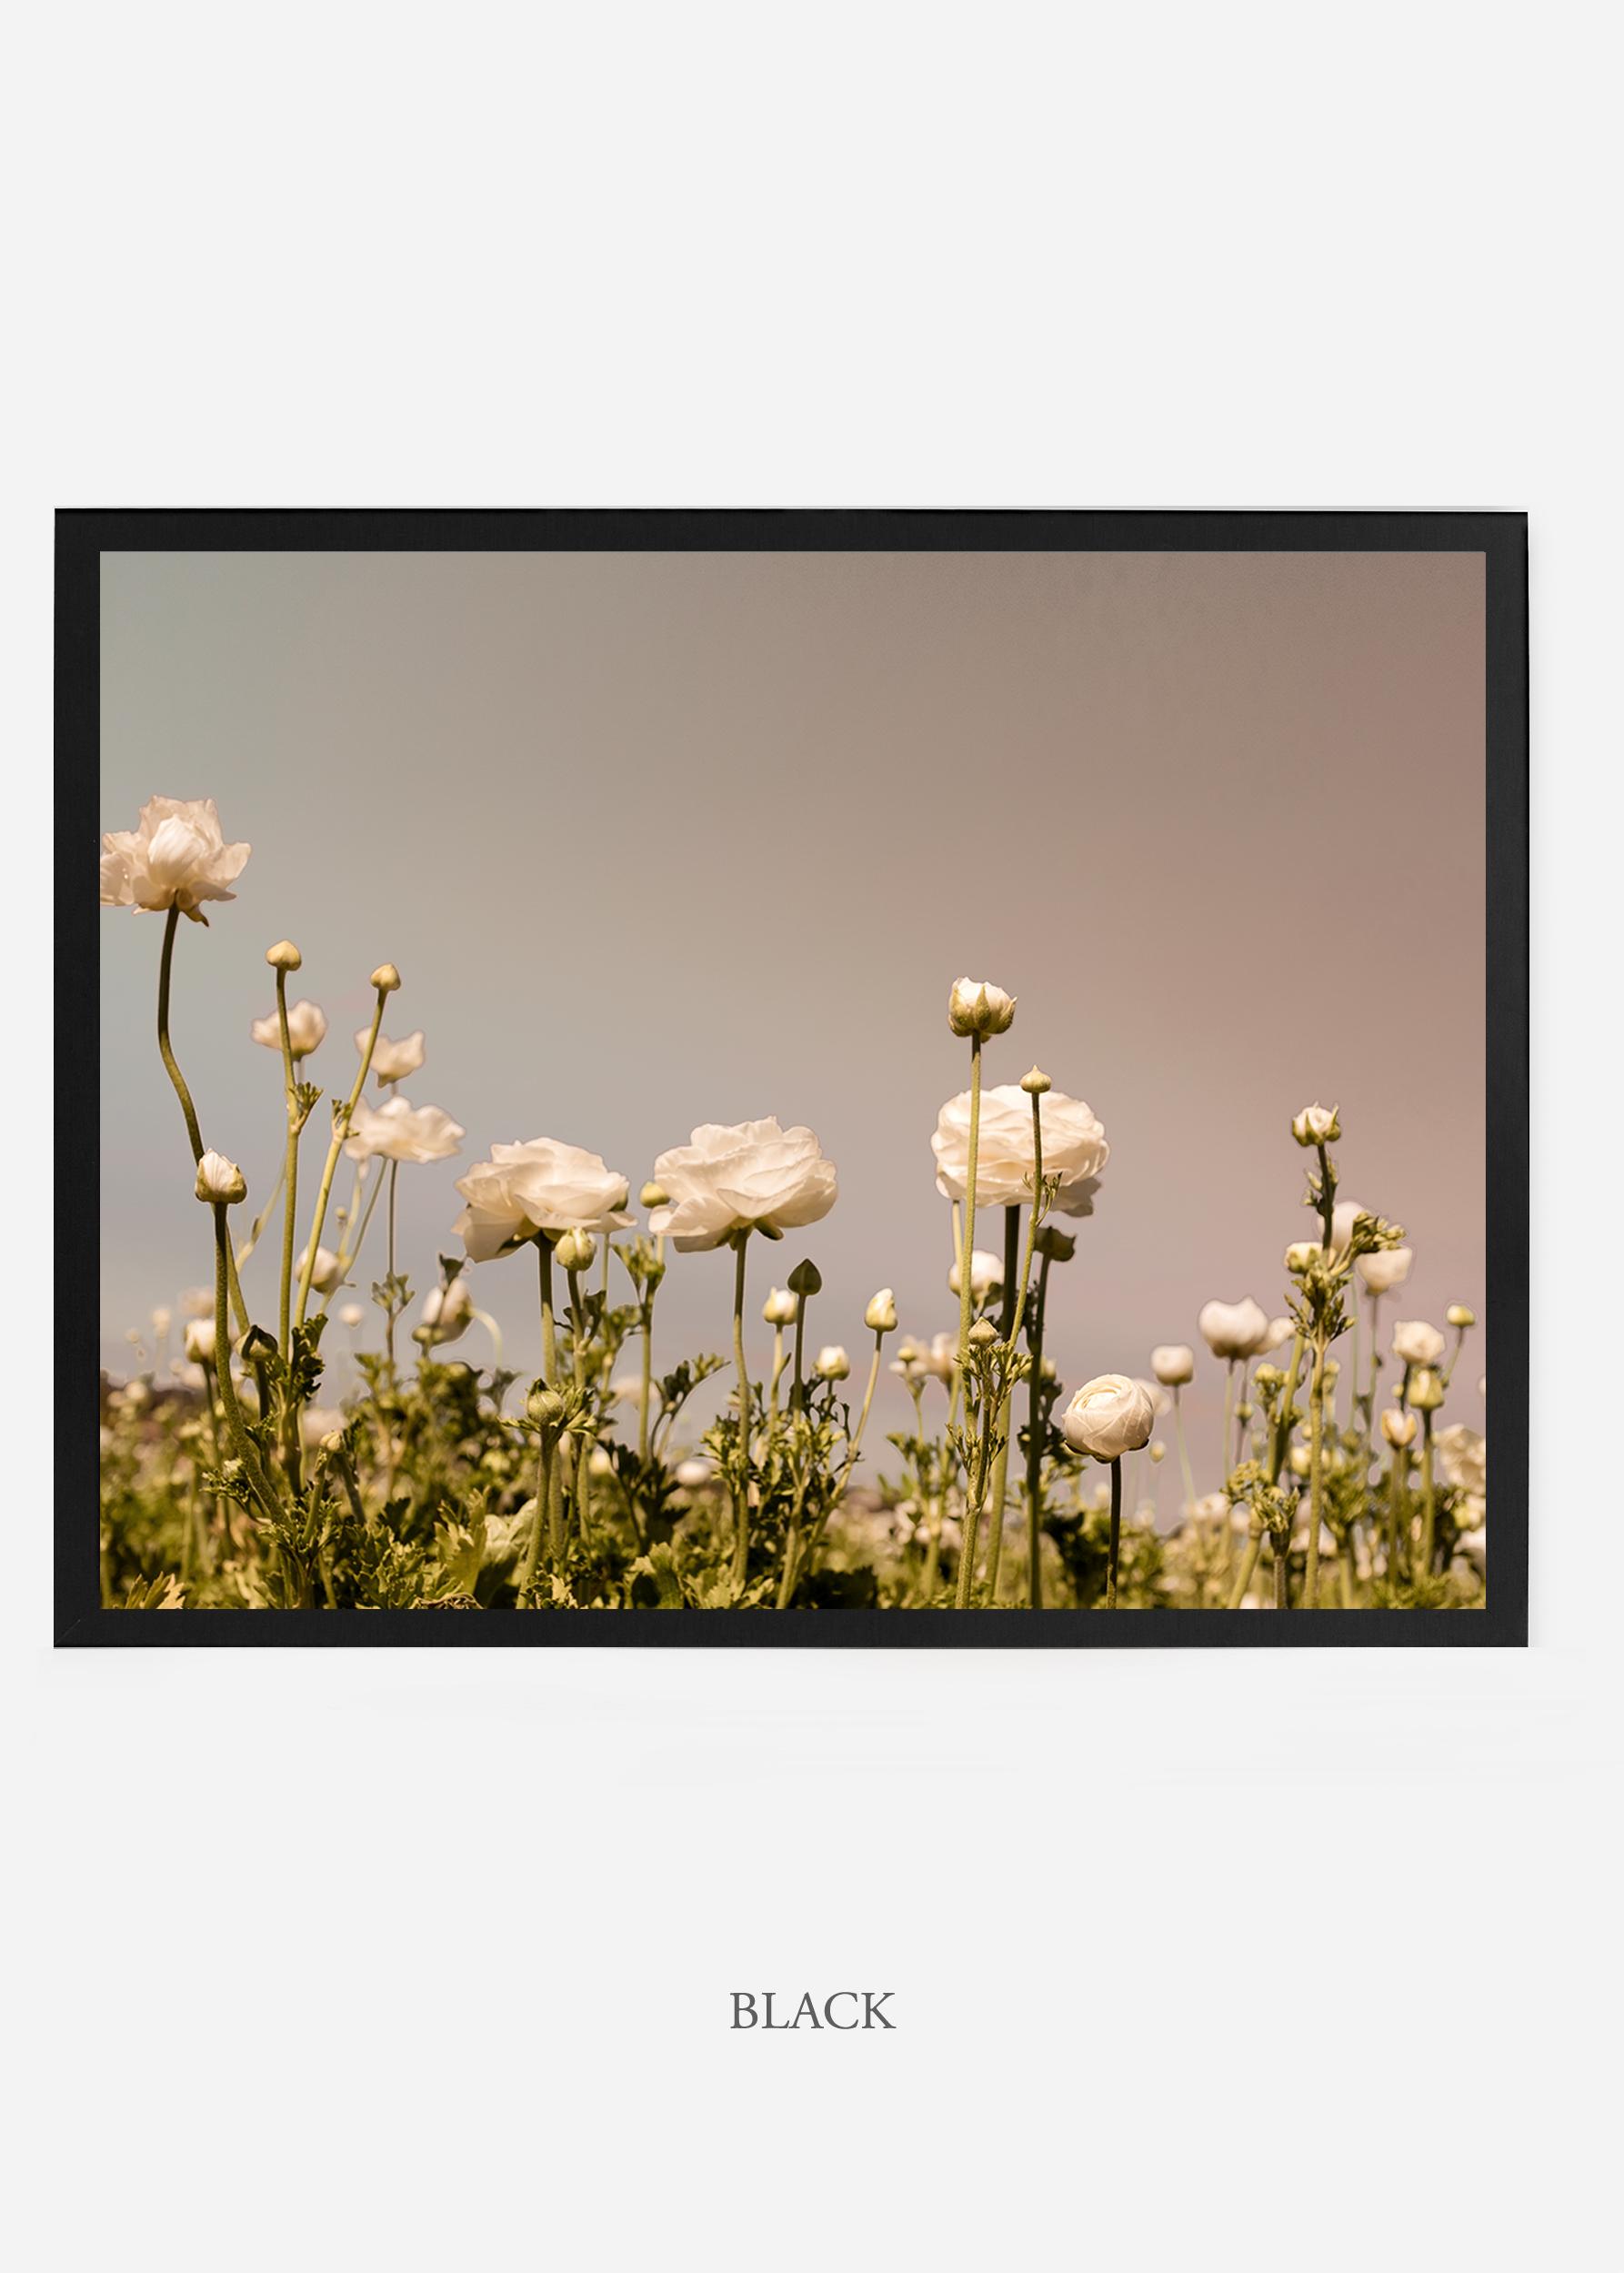 NoMat-BlackFrame-flora-6-Wilder-California-Art-Floral-Home-decor-Prints-Dahlia-Botanical-Artwork-Interior-design.jpg